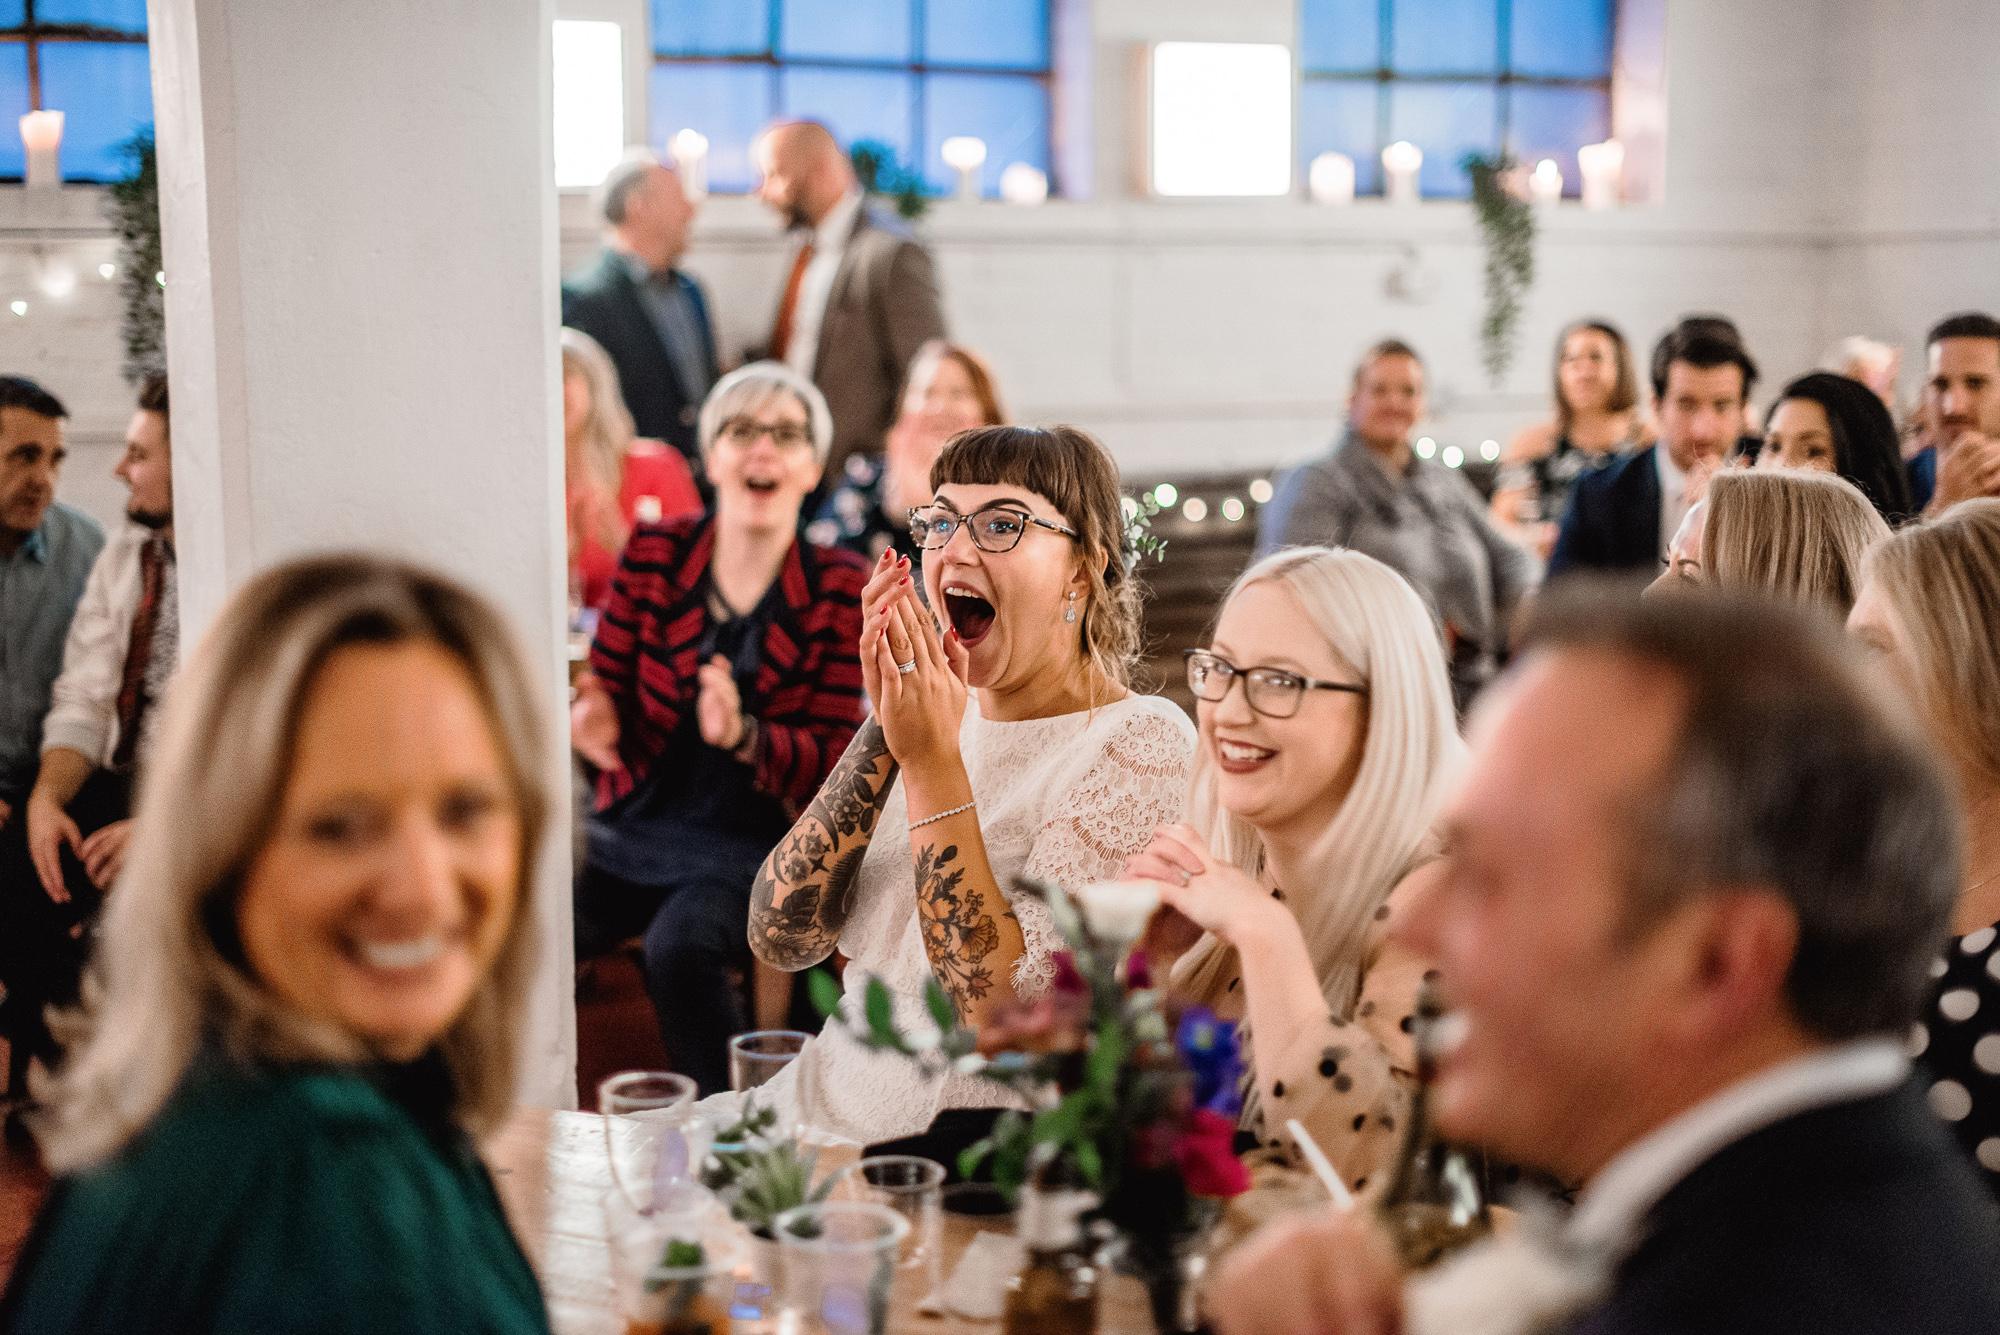 Harriet-Dahlia-Bespoke-Lace-Silk-Bohemian-Wedding-Dress-Sleeves-Tattooed-Bride-Alternative-Wedding-Sheffield-33.jpg